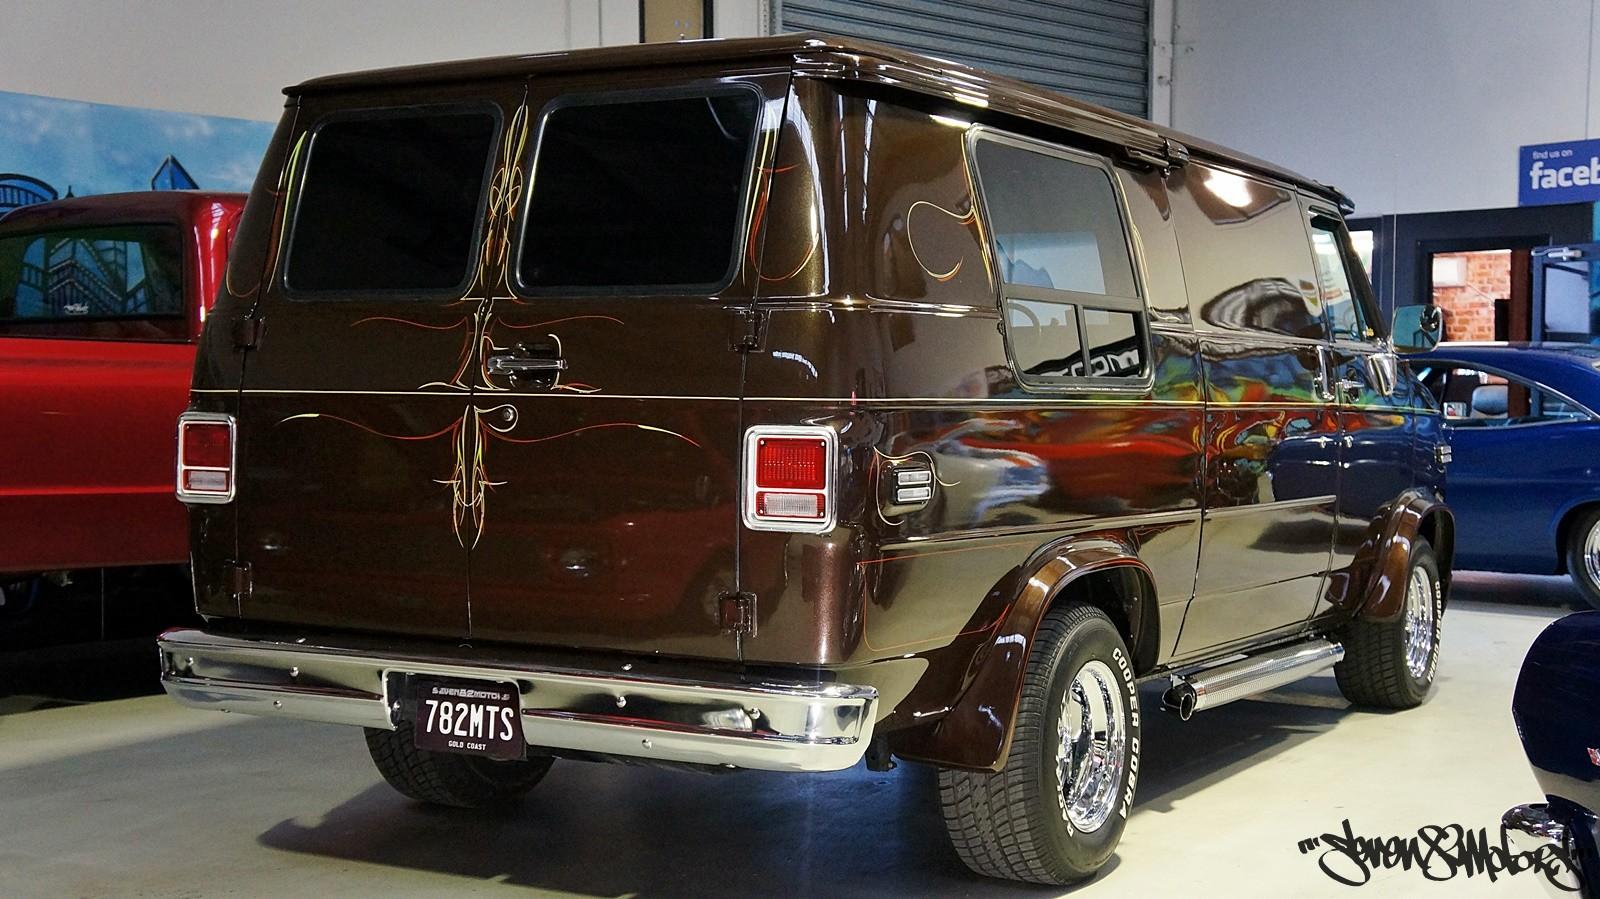 sold 1984 chevy g20 van seven82motors. Black Bedroom Furniture Sets. Home Design Ideas